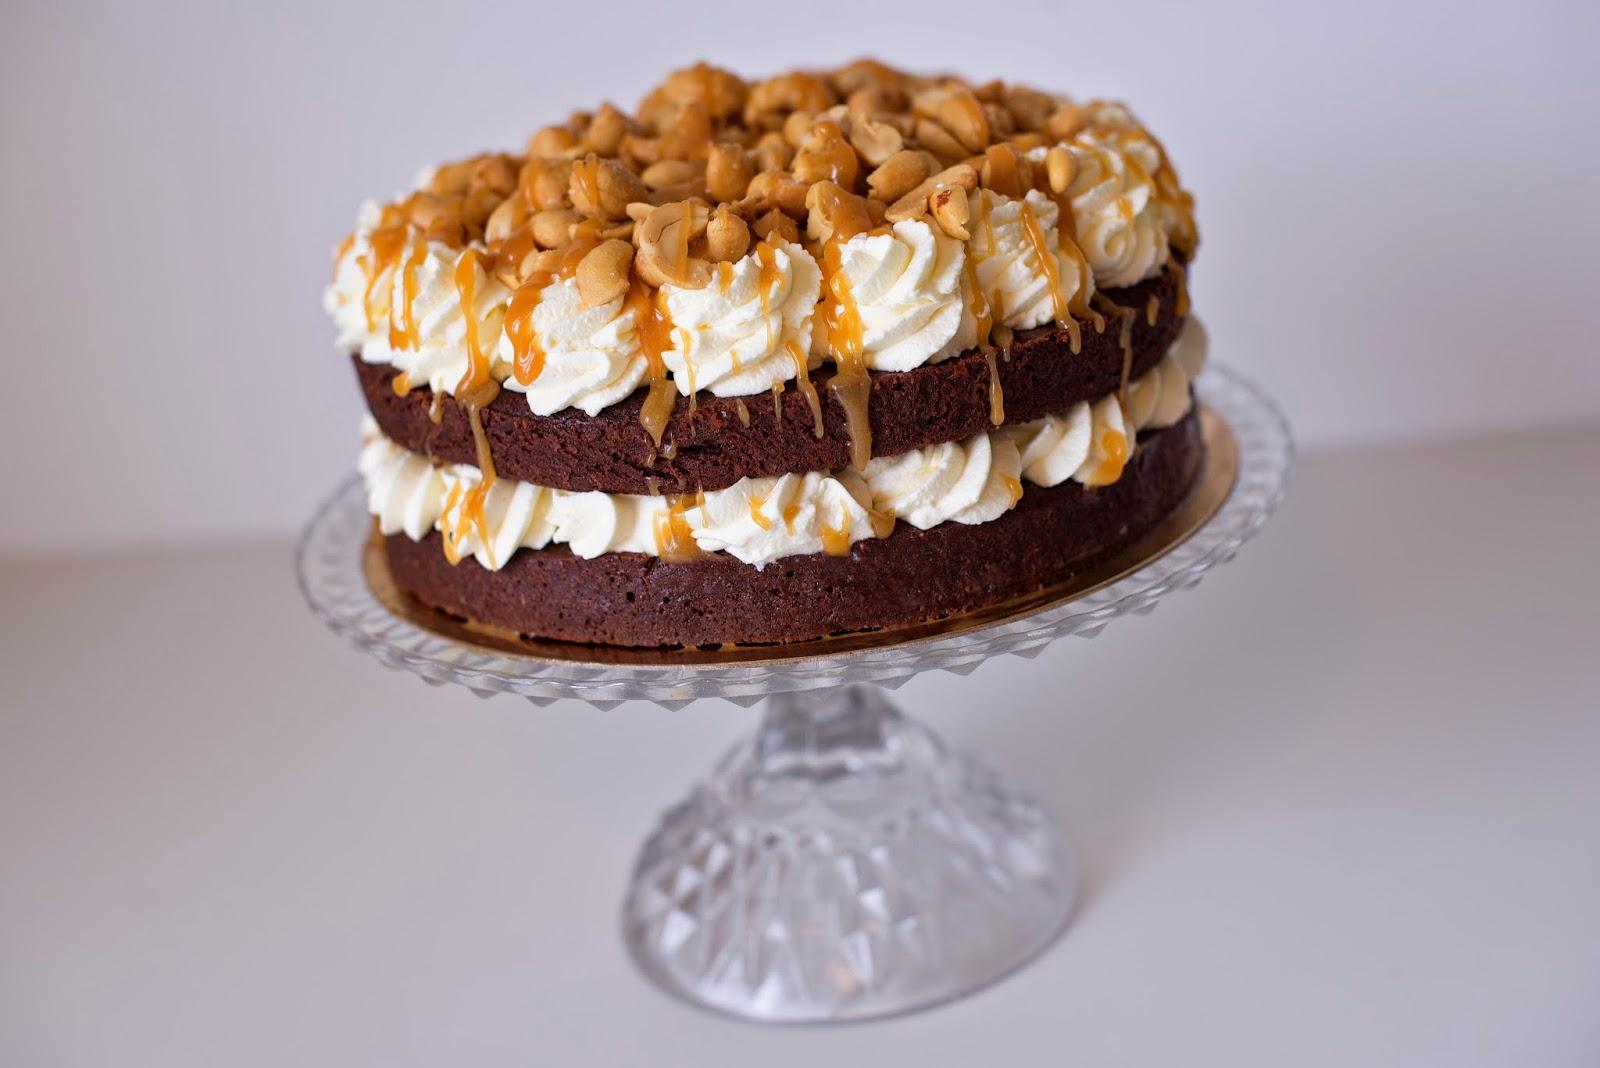 chokladtårta med nötter